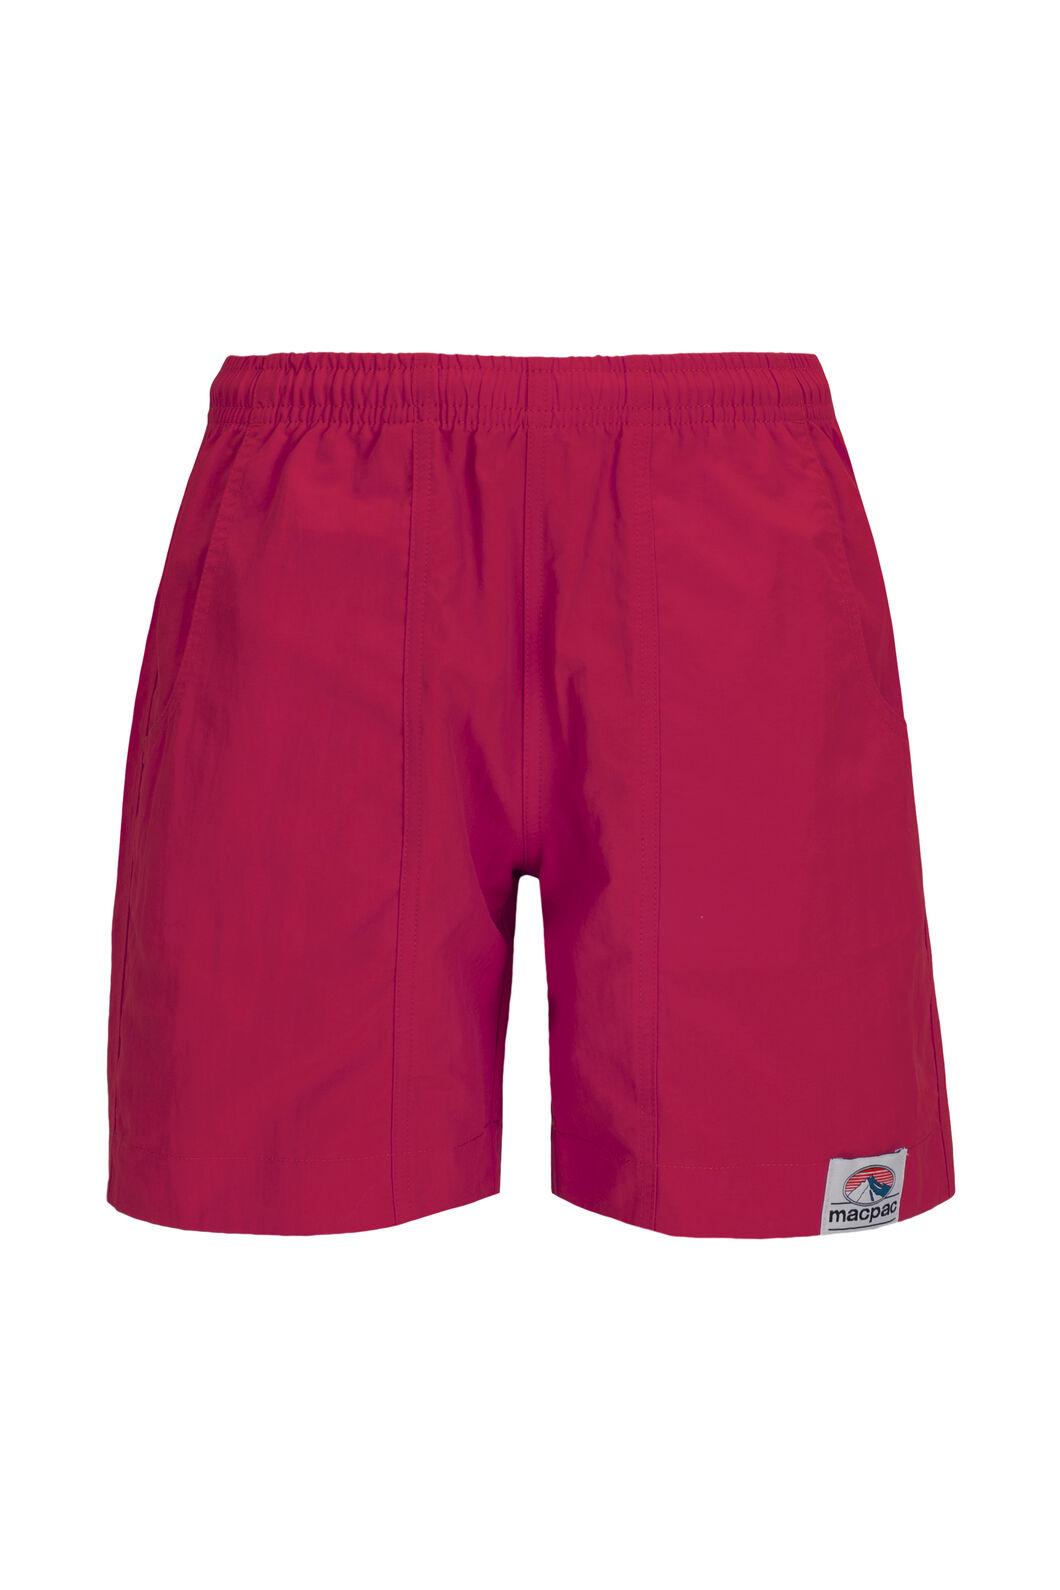 Macpac Winger Shorts — Kids', Raspberry Wine, hi-res